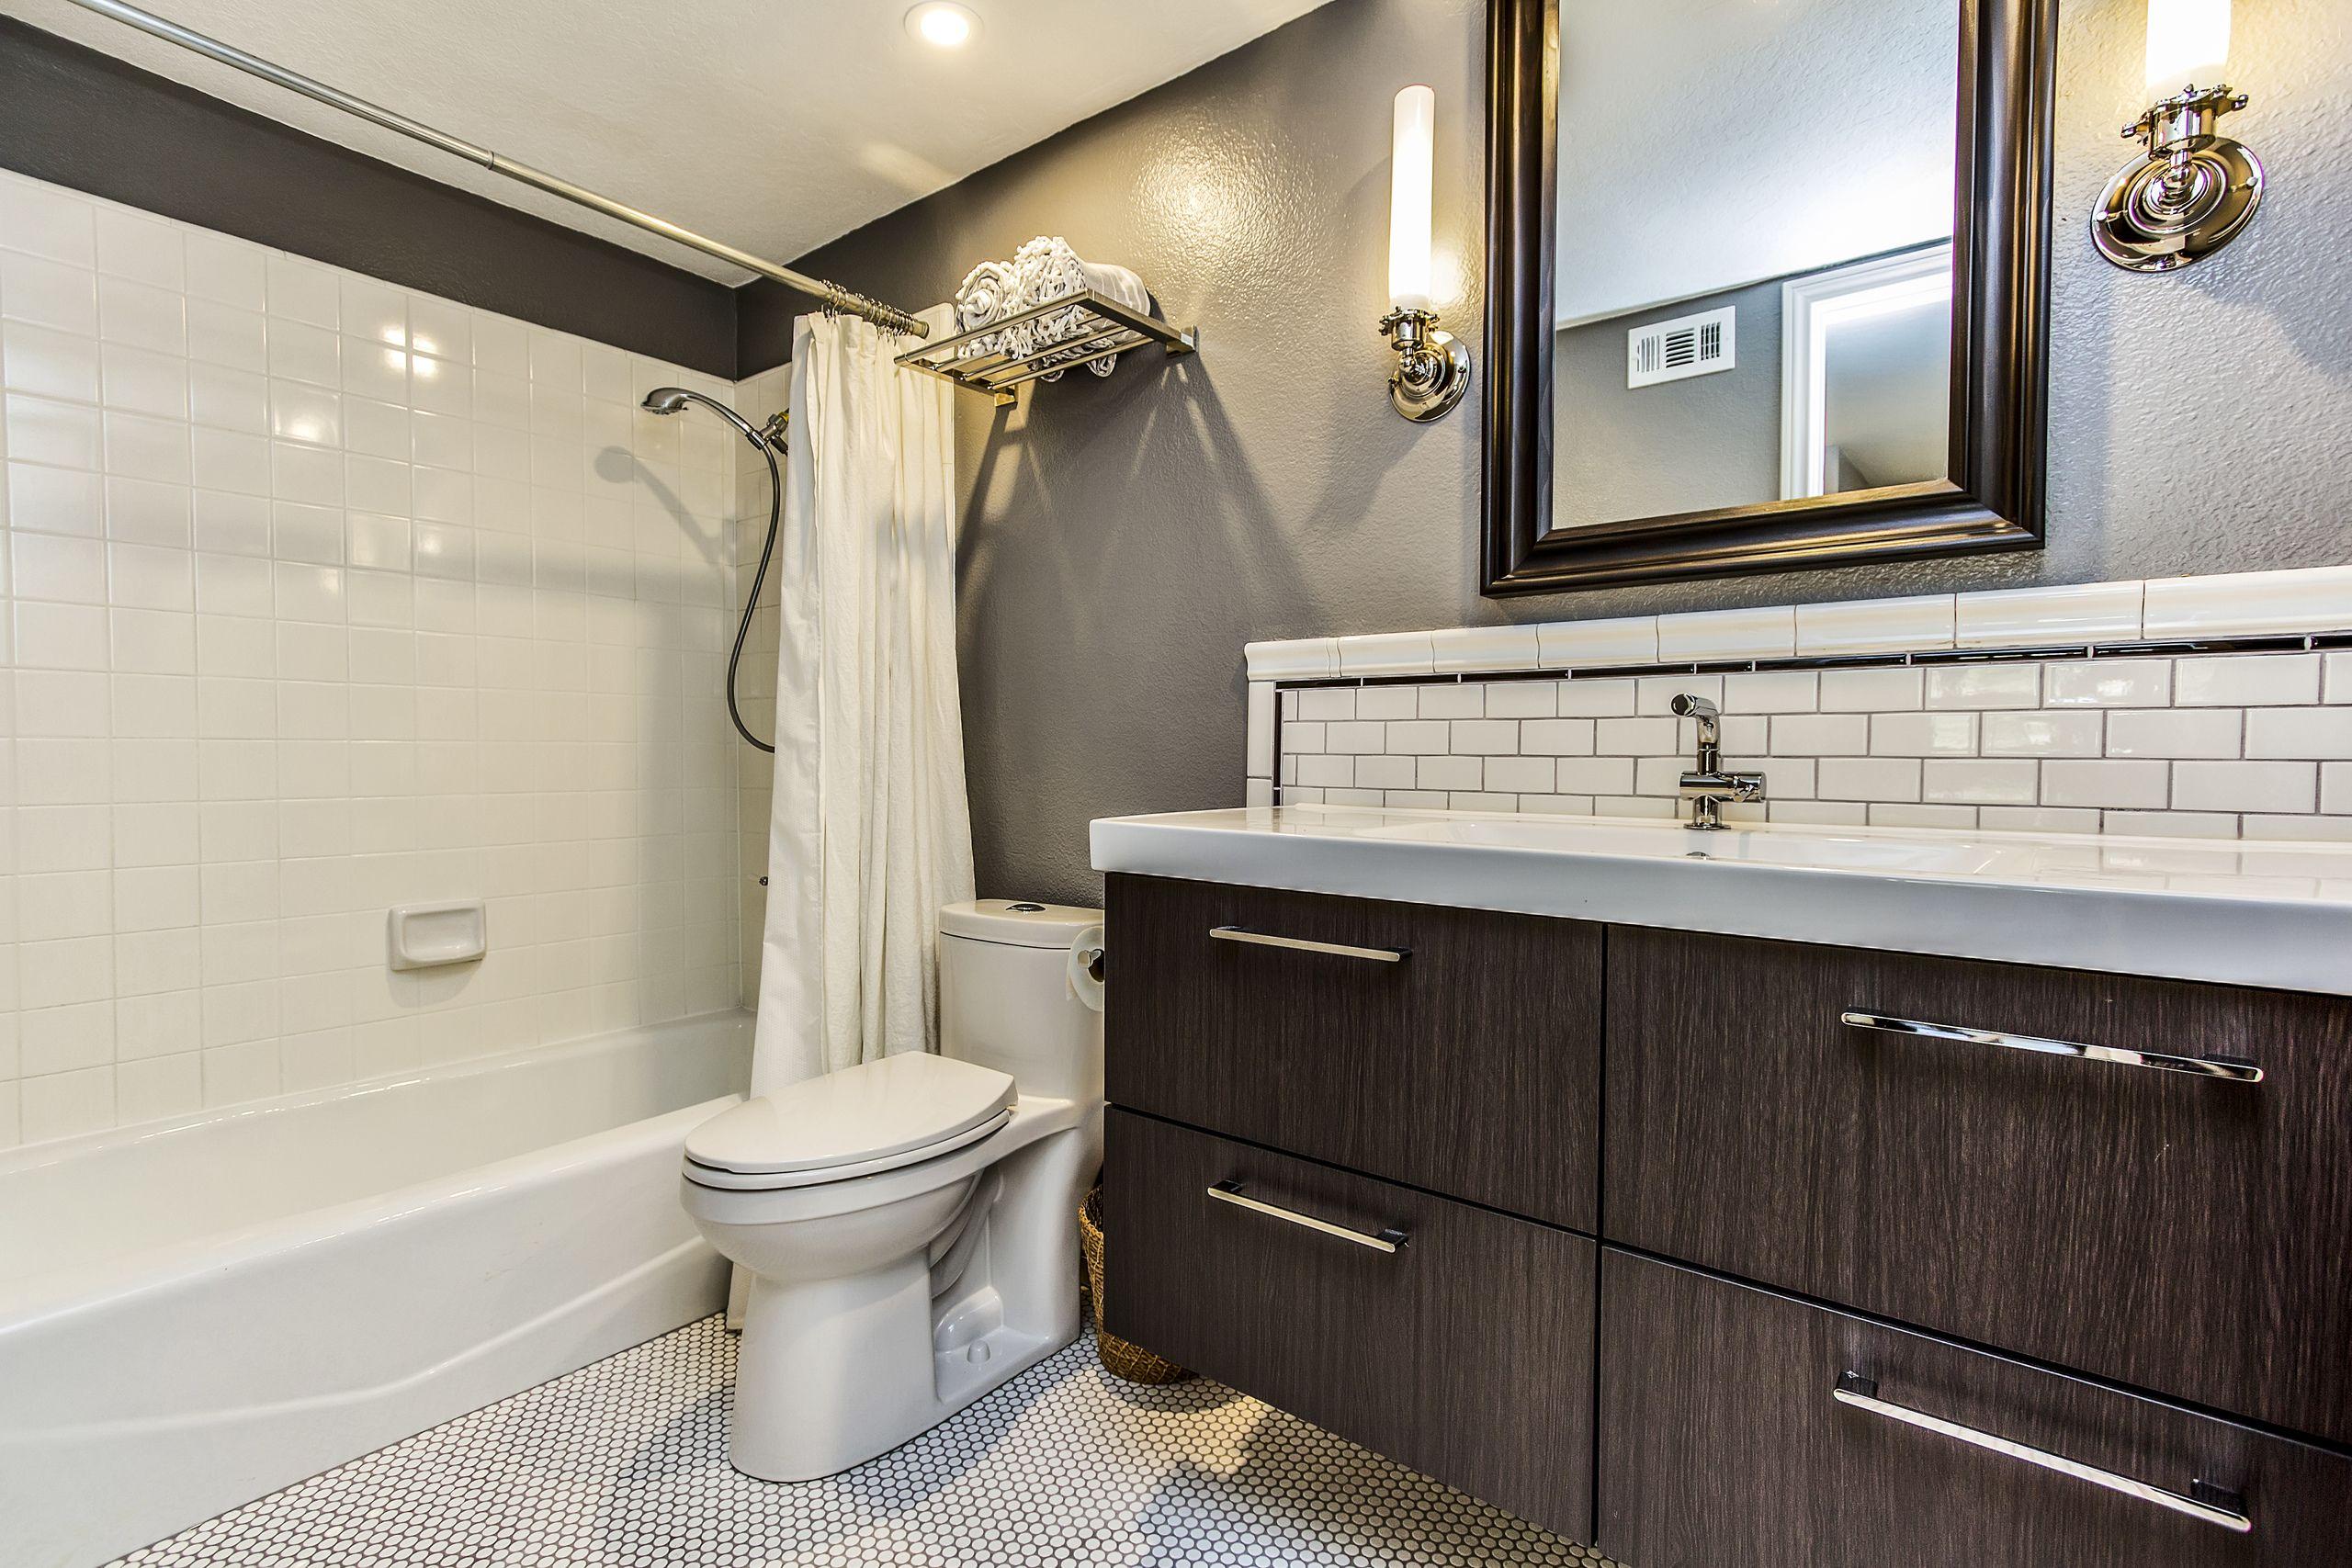 Bathroom Remodel Small Train Rack Subway Tile Backsplash With